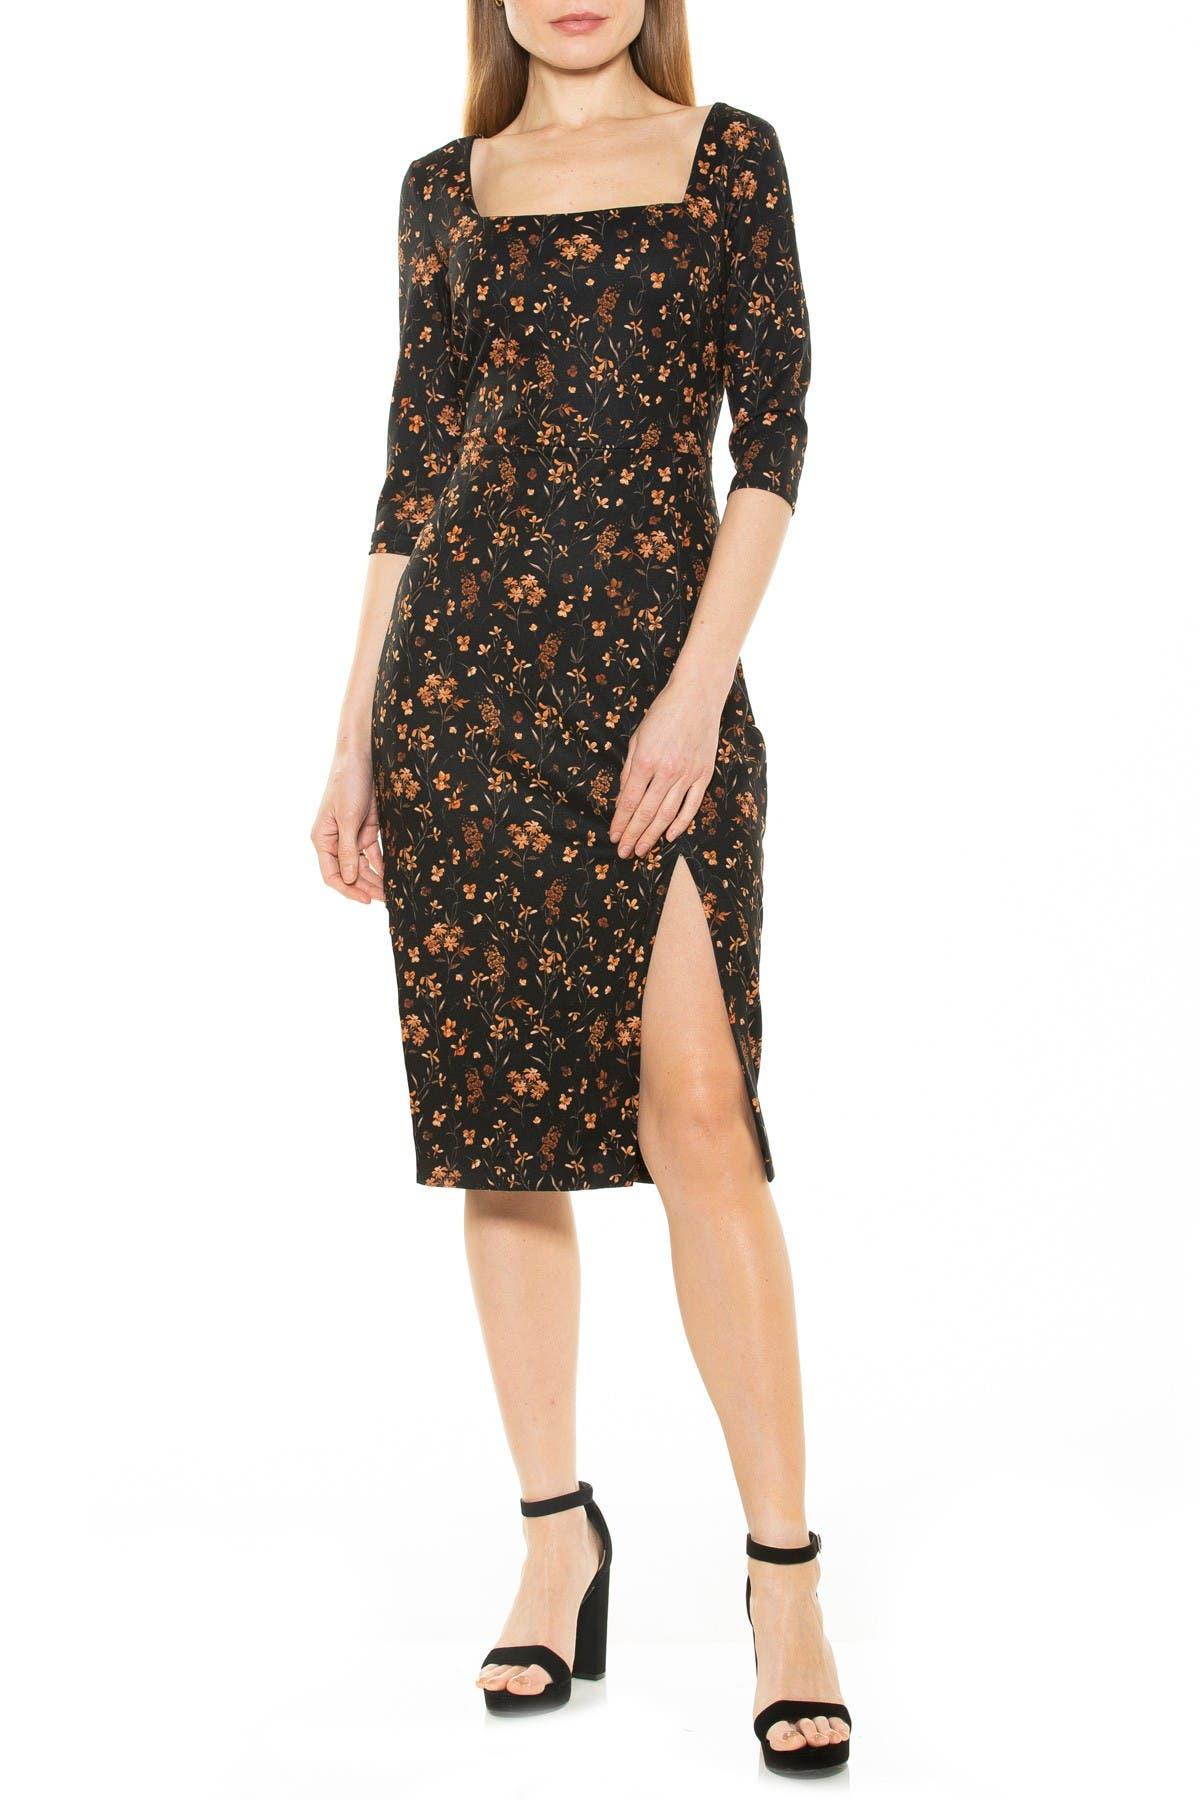 Image of Alexia Admor Emily Square Neck Midi Dress